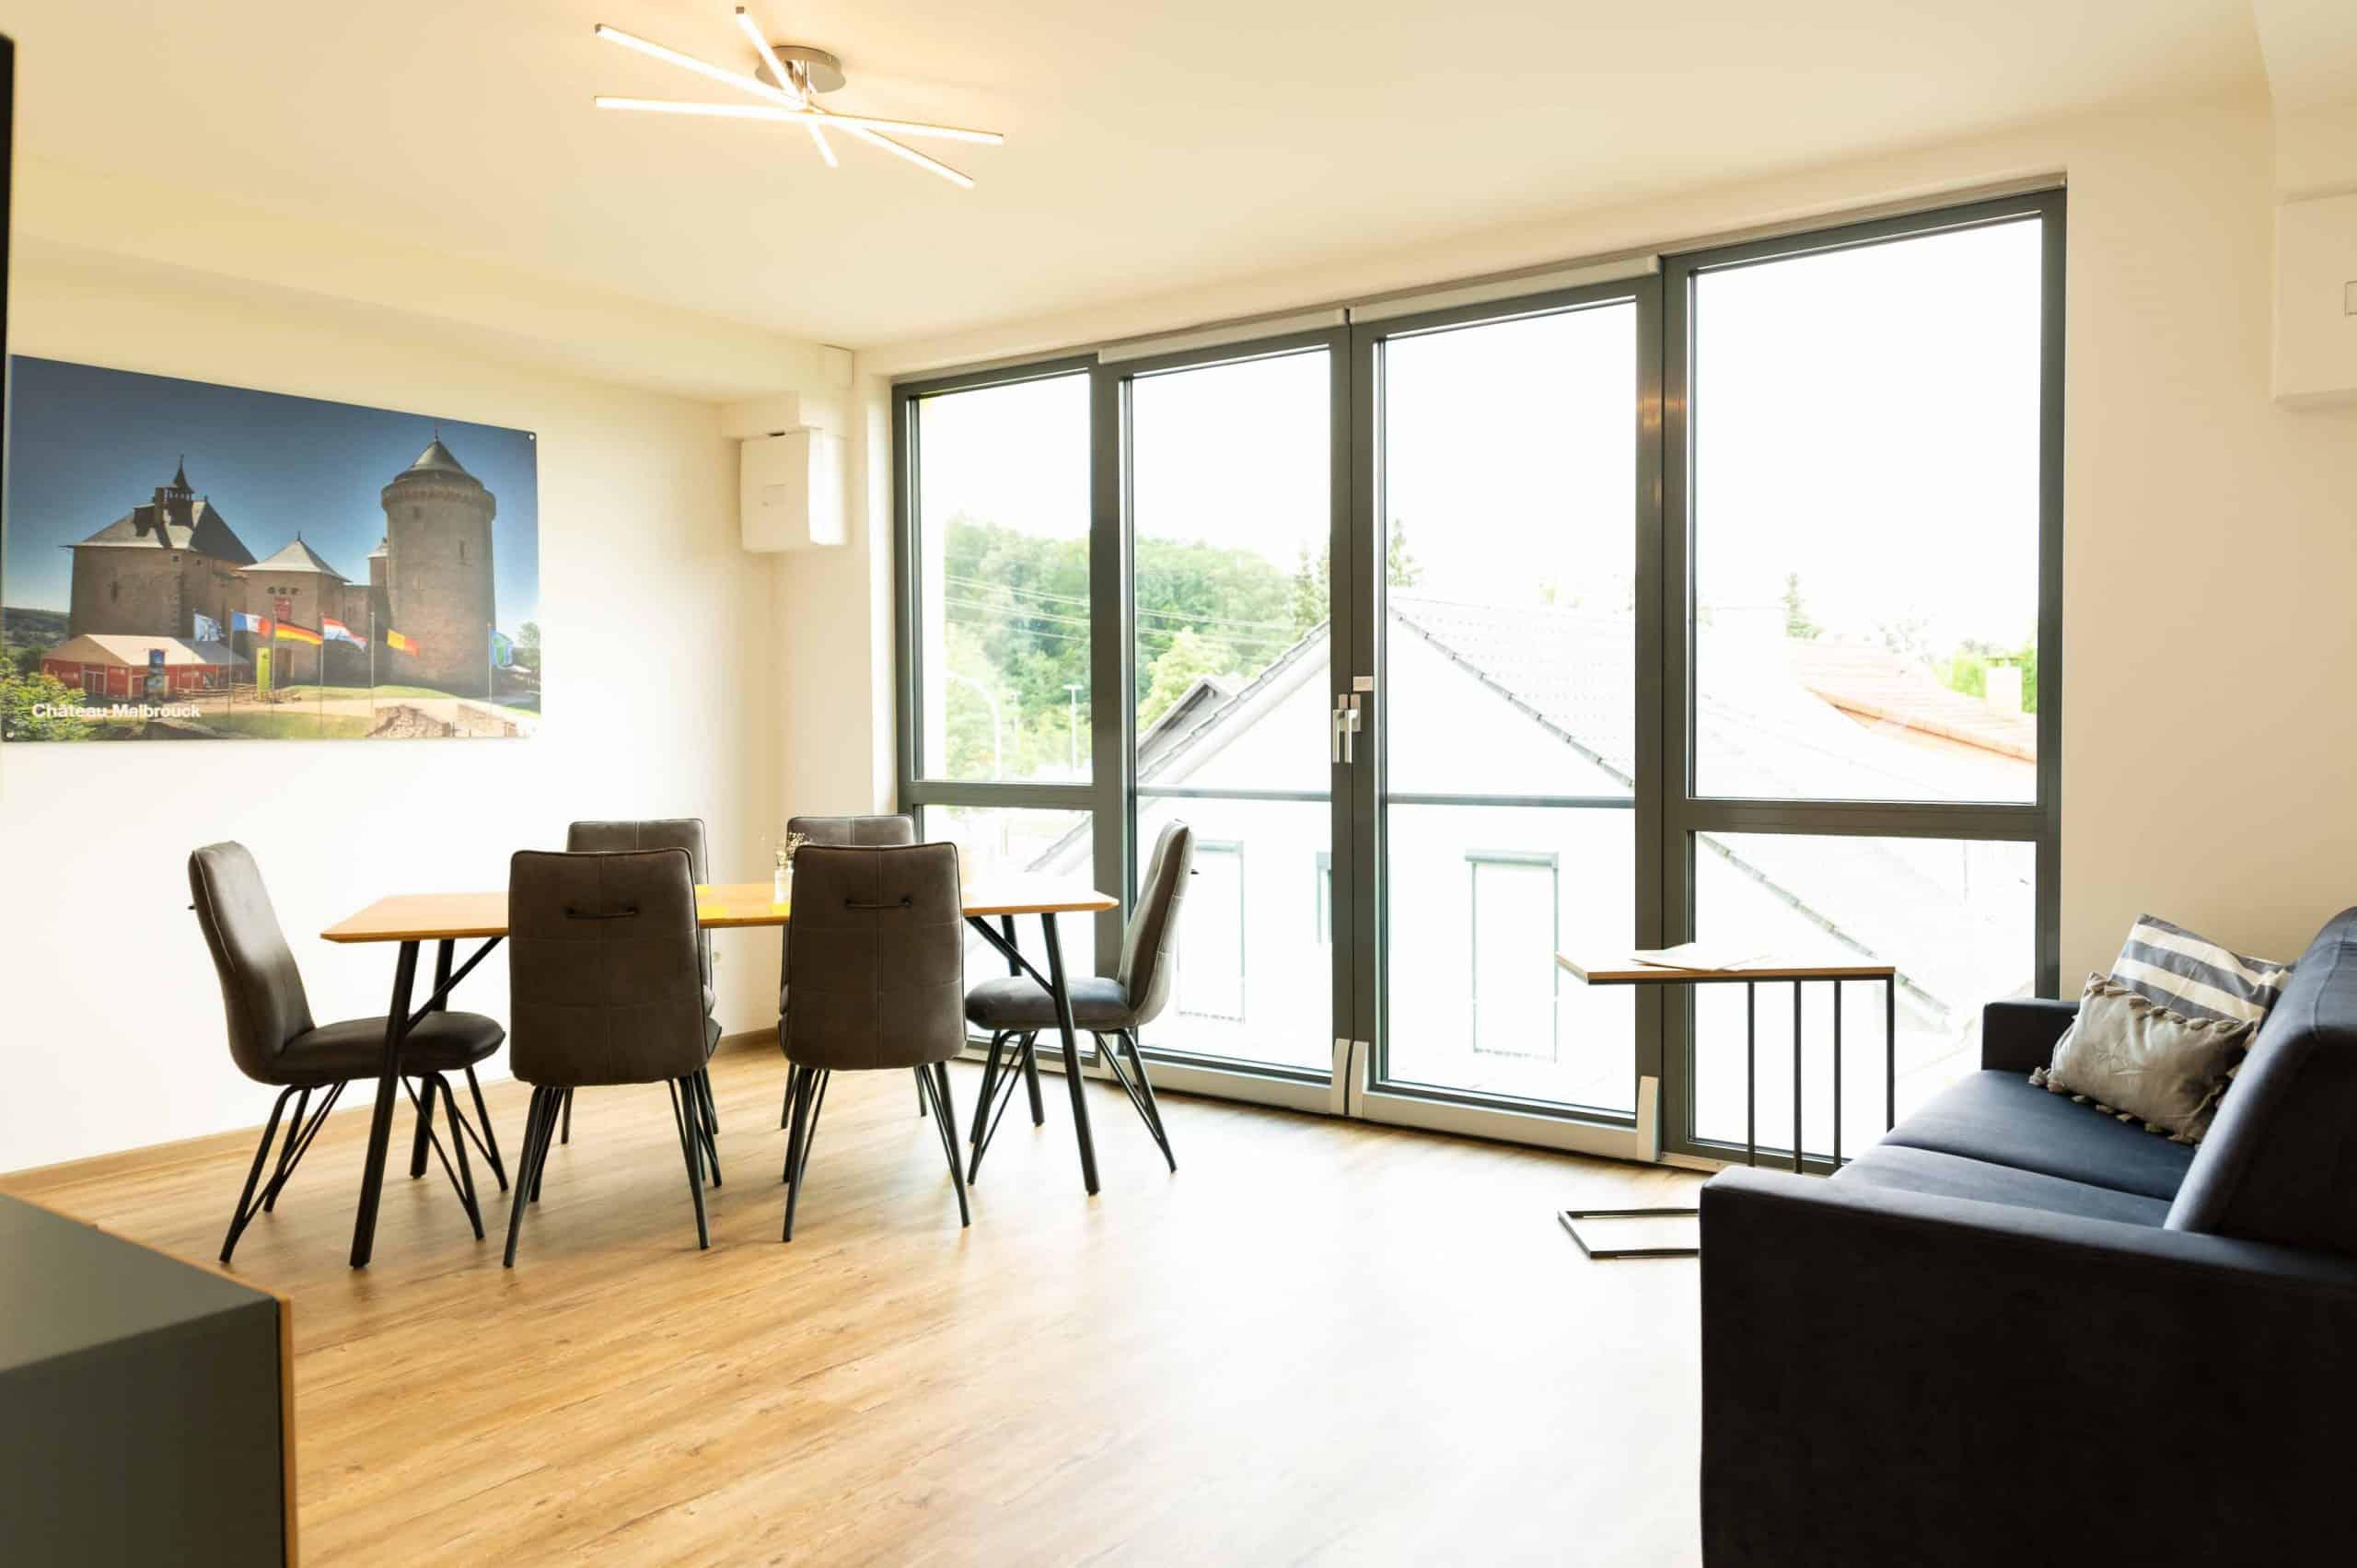 appartement-chateau-de-malbrouck-esszimmer-panorama